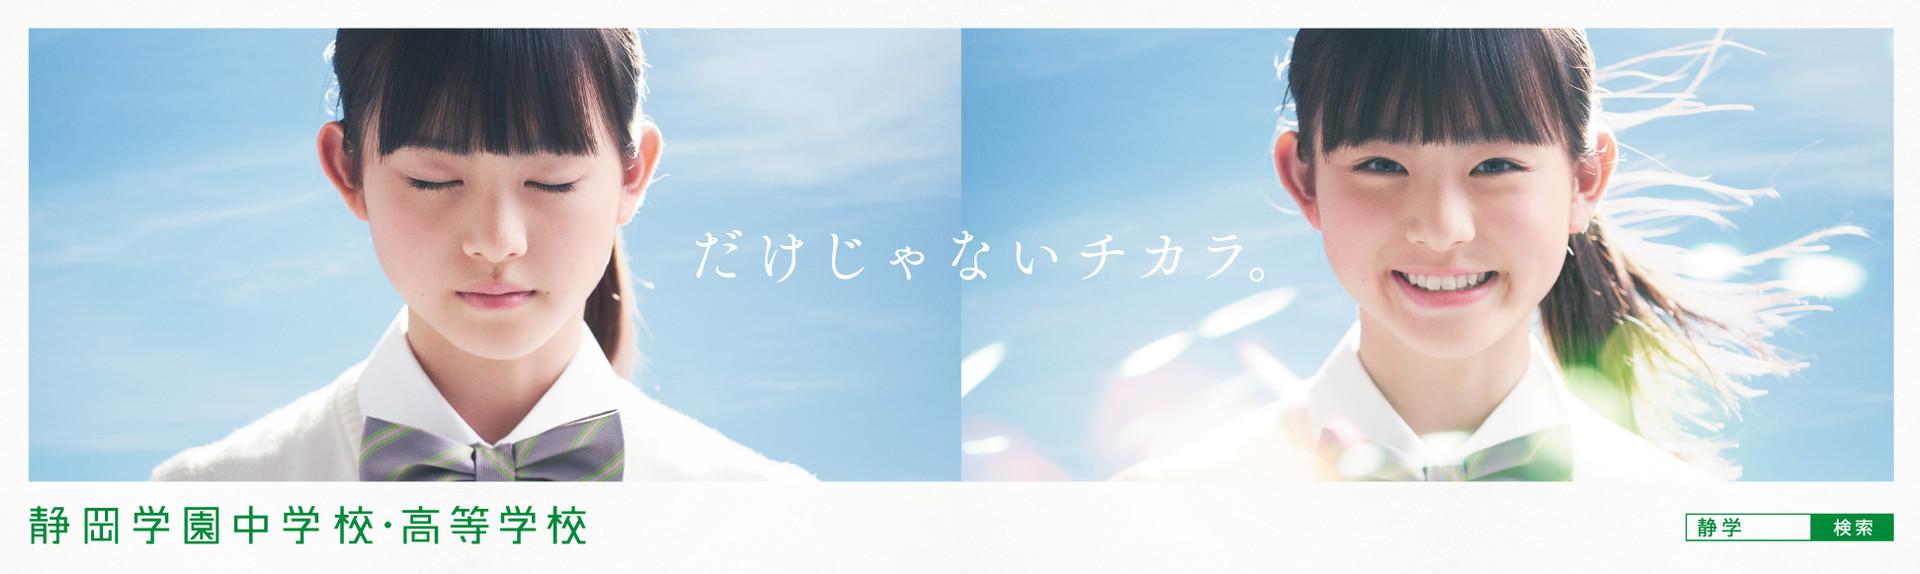 shizuokagakuen_works_03.jpg